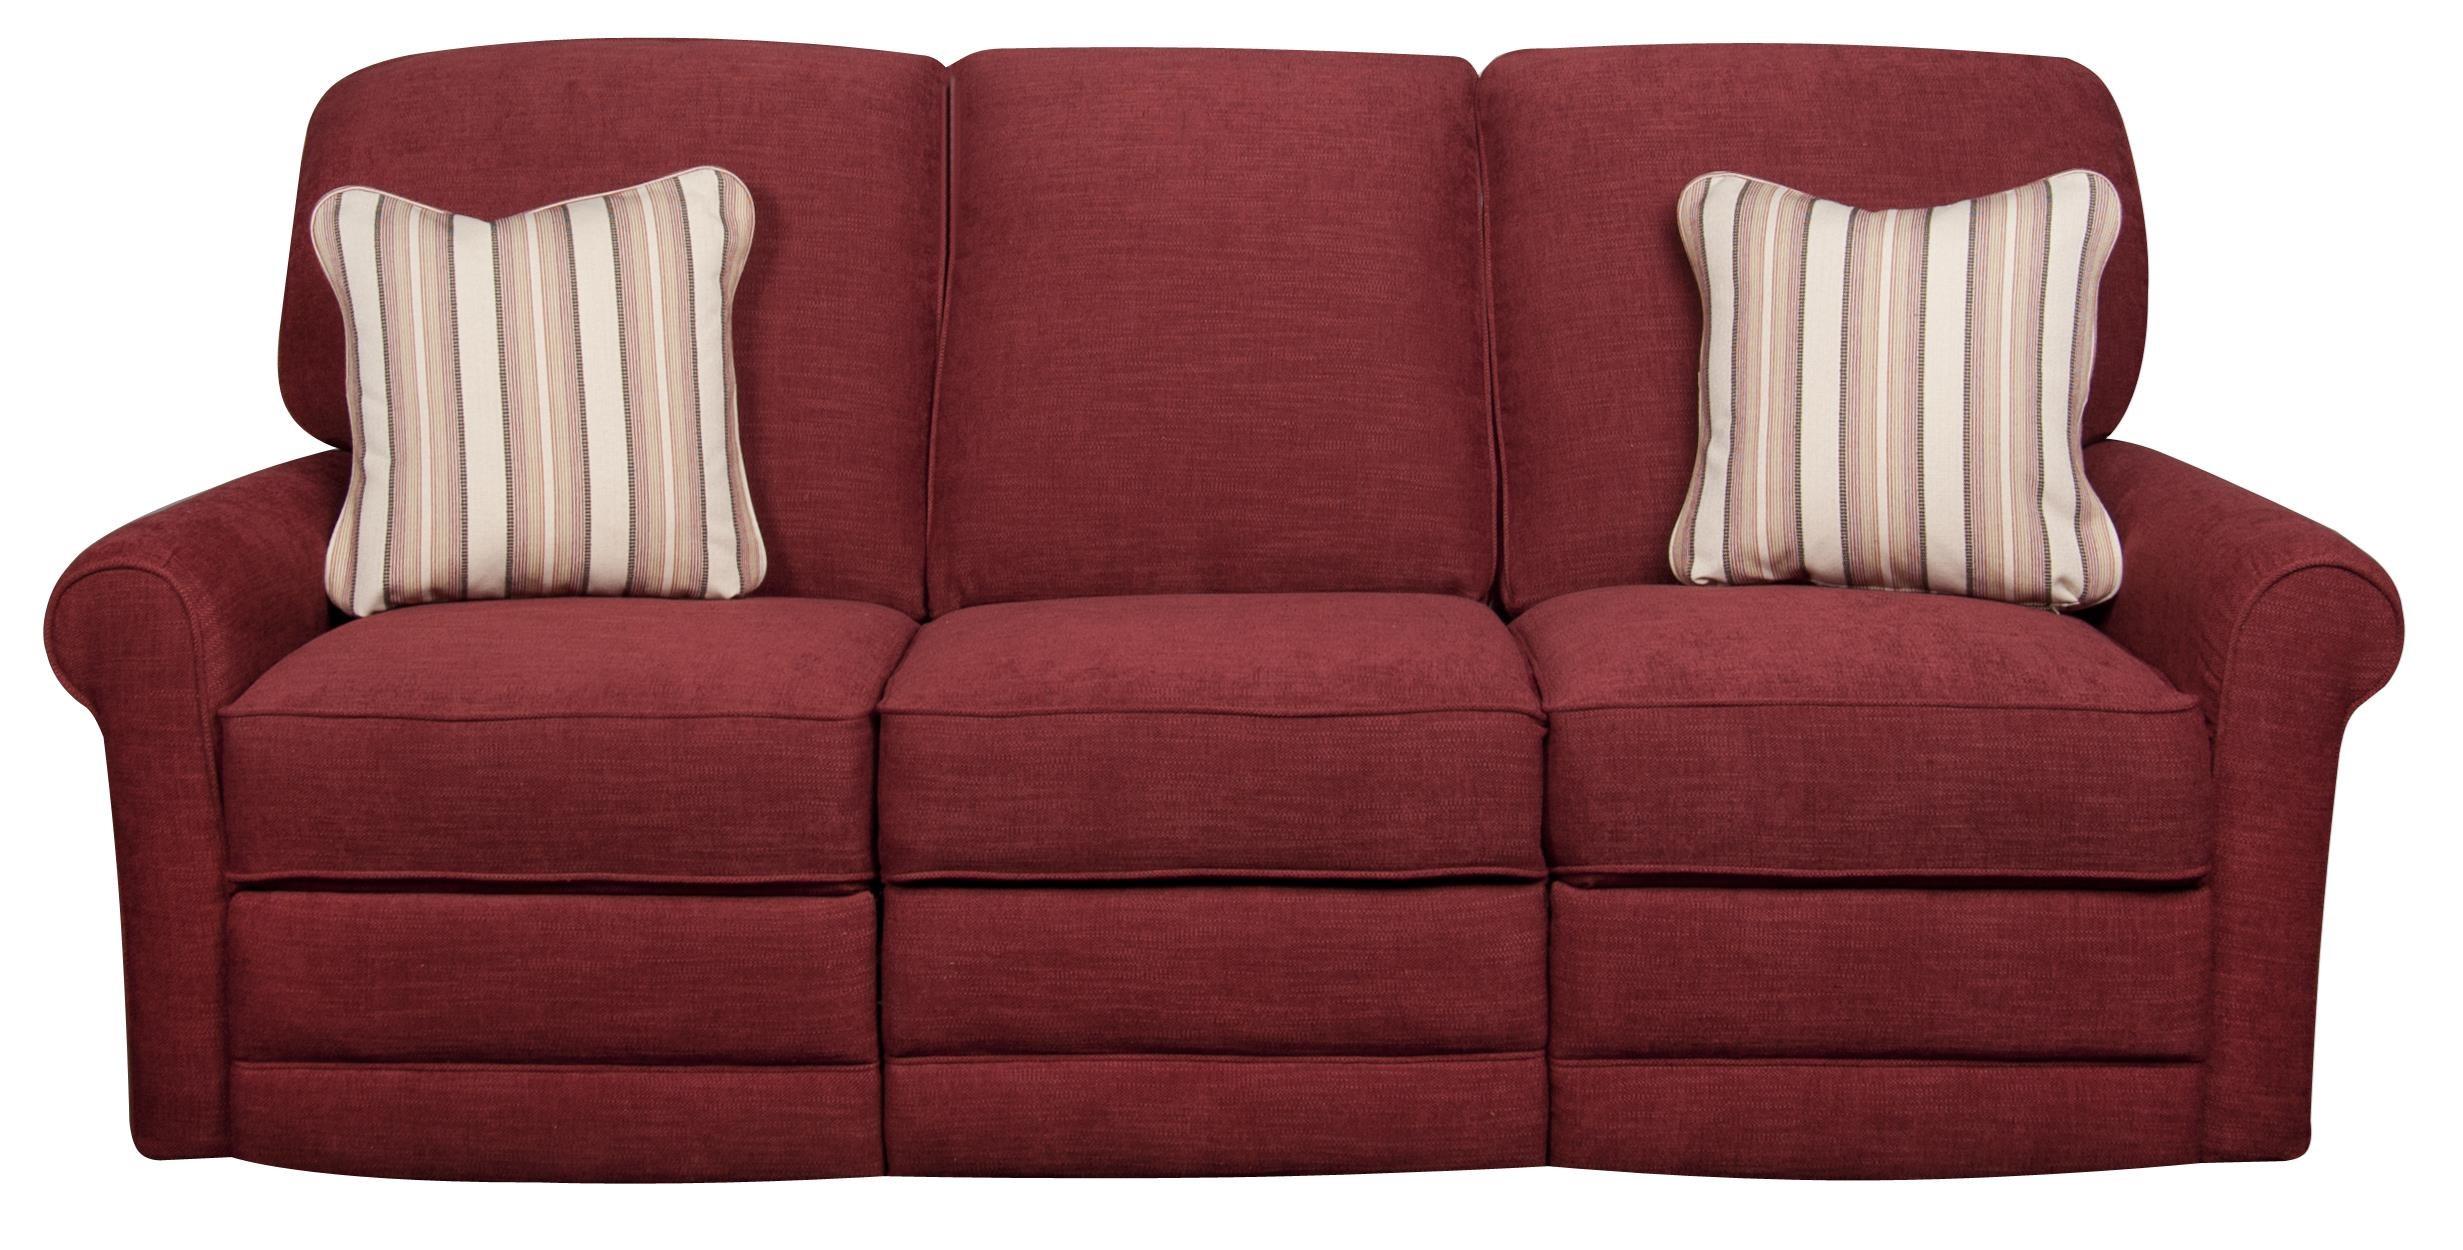 La-Z-Boy Addison Addison Power Reclining Sofa - Item Number: 931971845